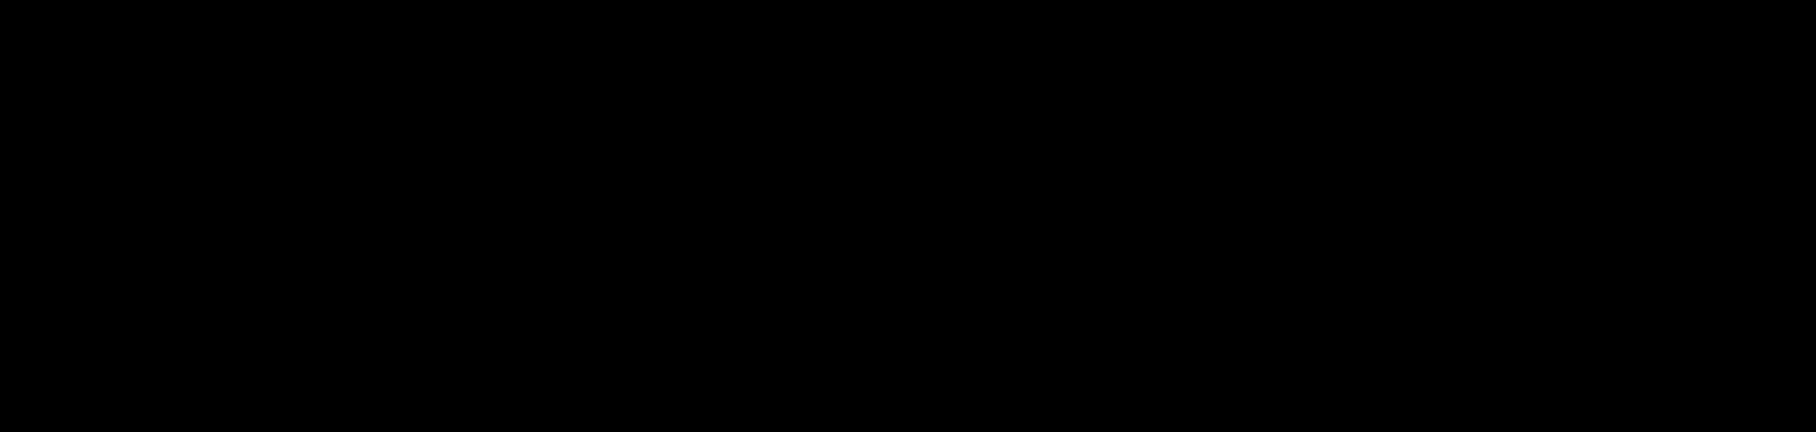 (S)-Pramipexole-d<sub>3</sub> dihydrochloride